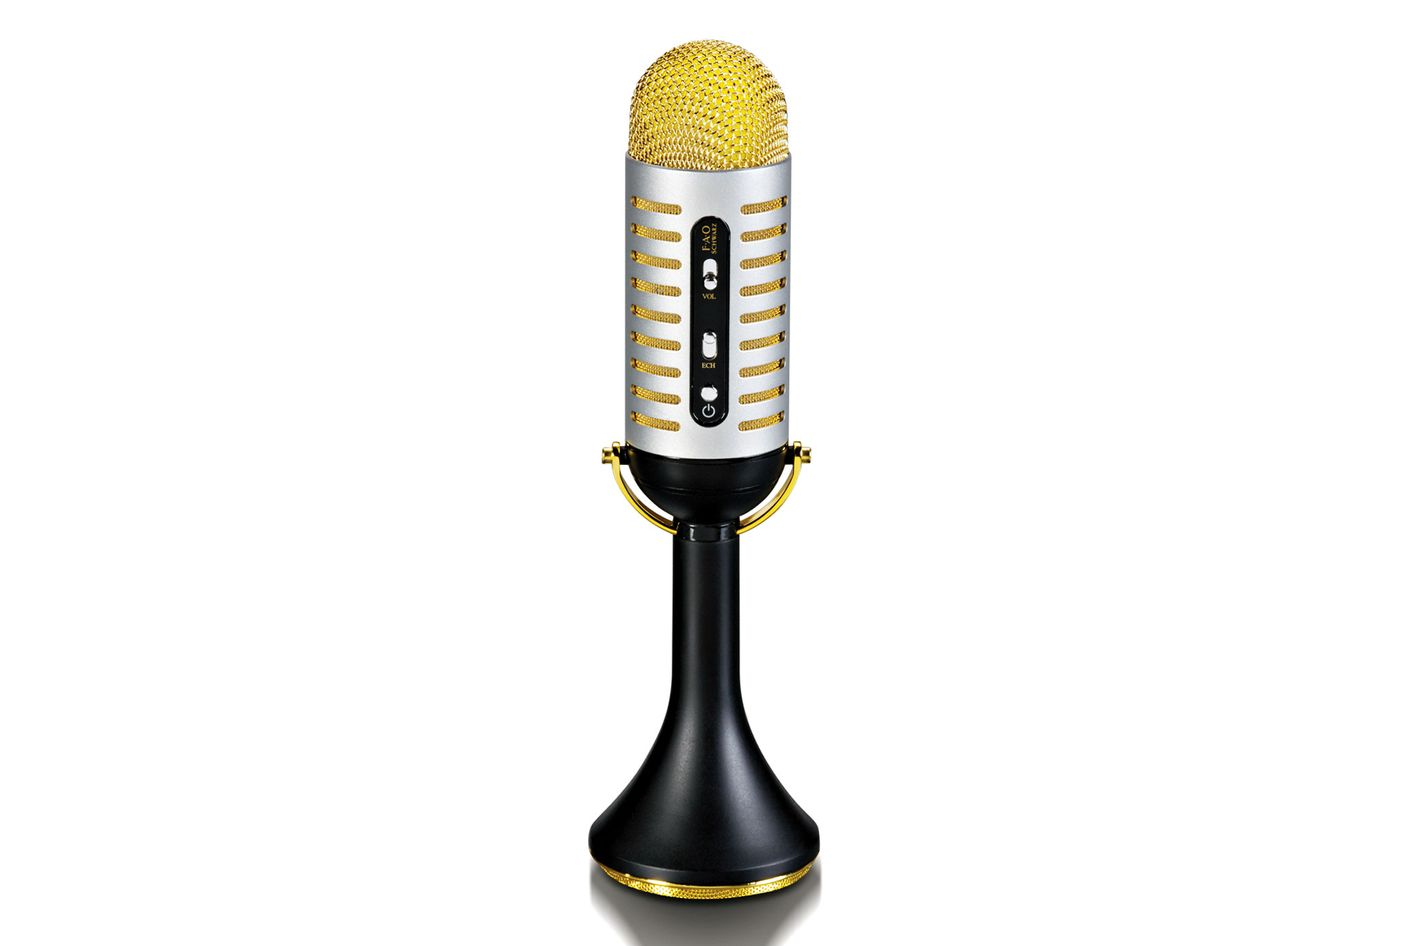 FAO Schwarz Bluetooth Vintage Musical Microphone